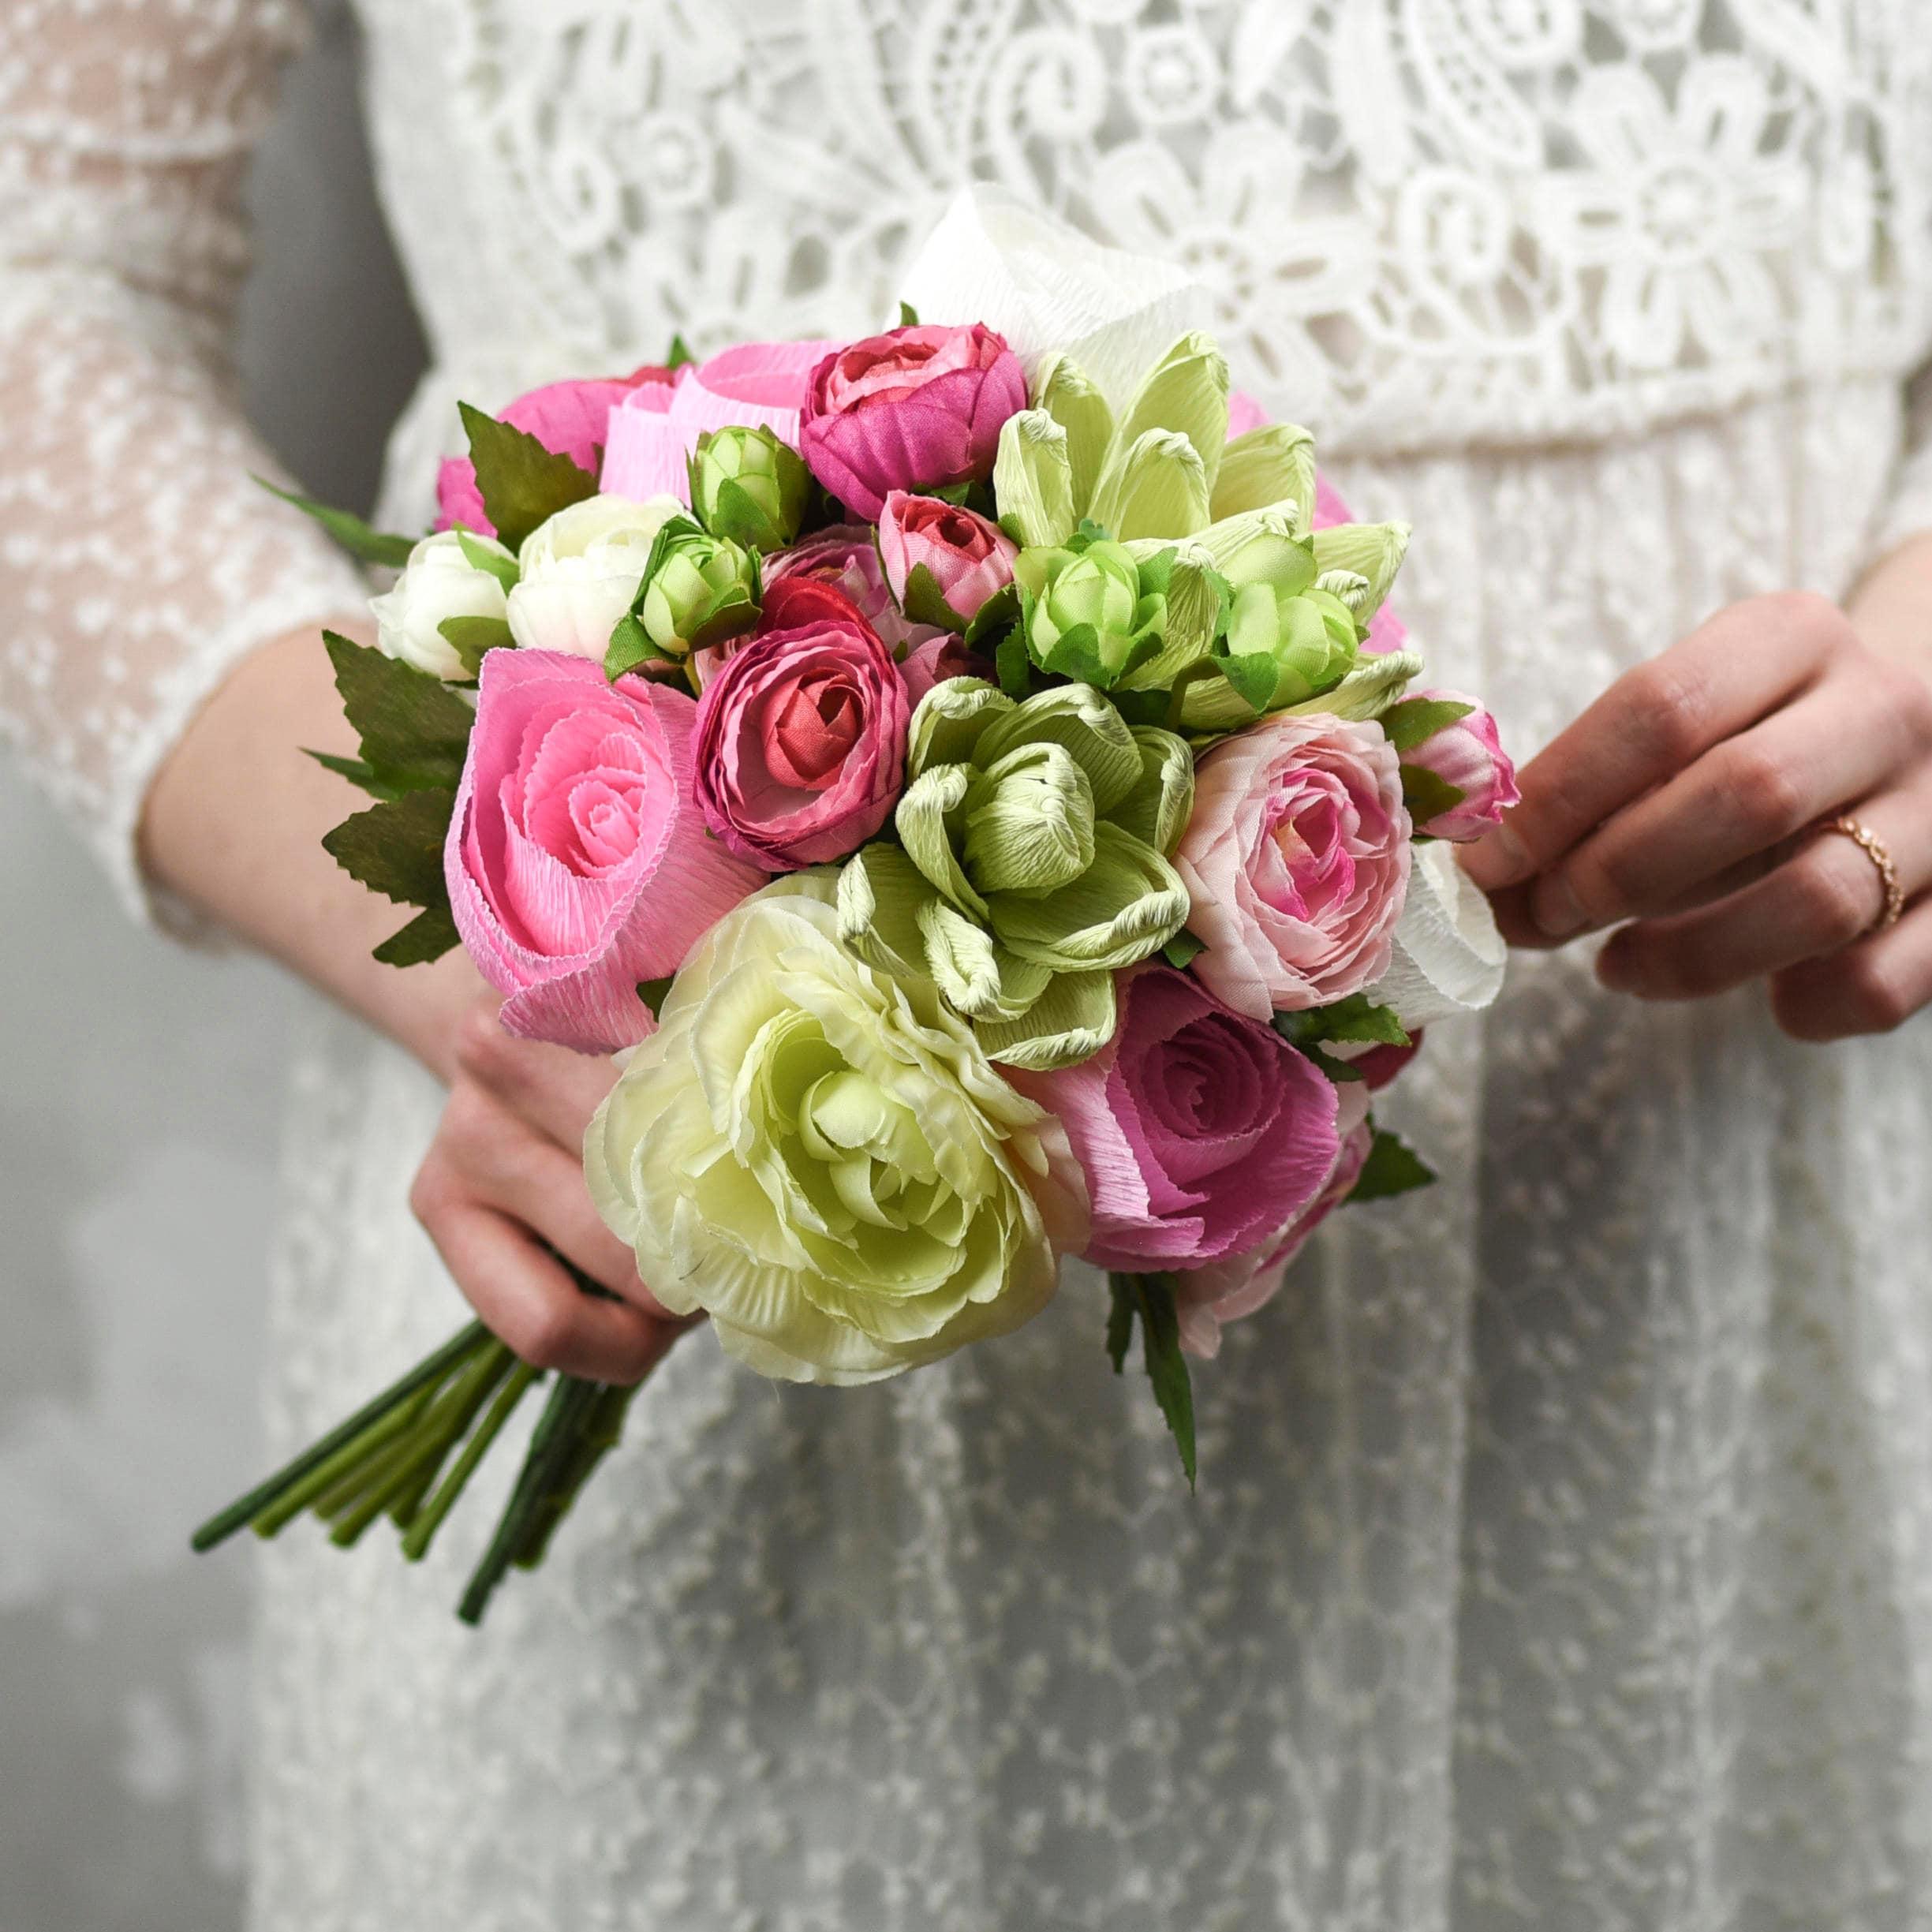 paper succulent bouquet  pink roses  paper succulents  silk ranunculus  silk greenery  paper bouquet  succulent wedding  cacti